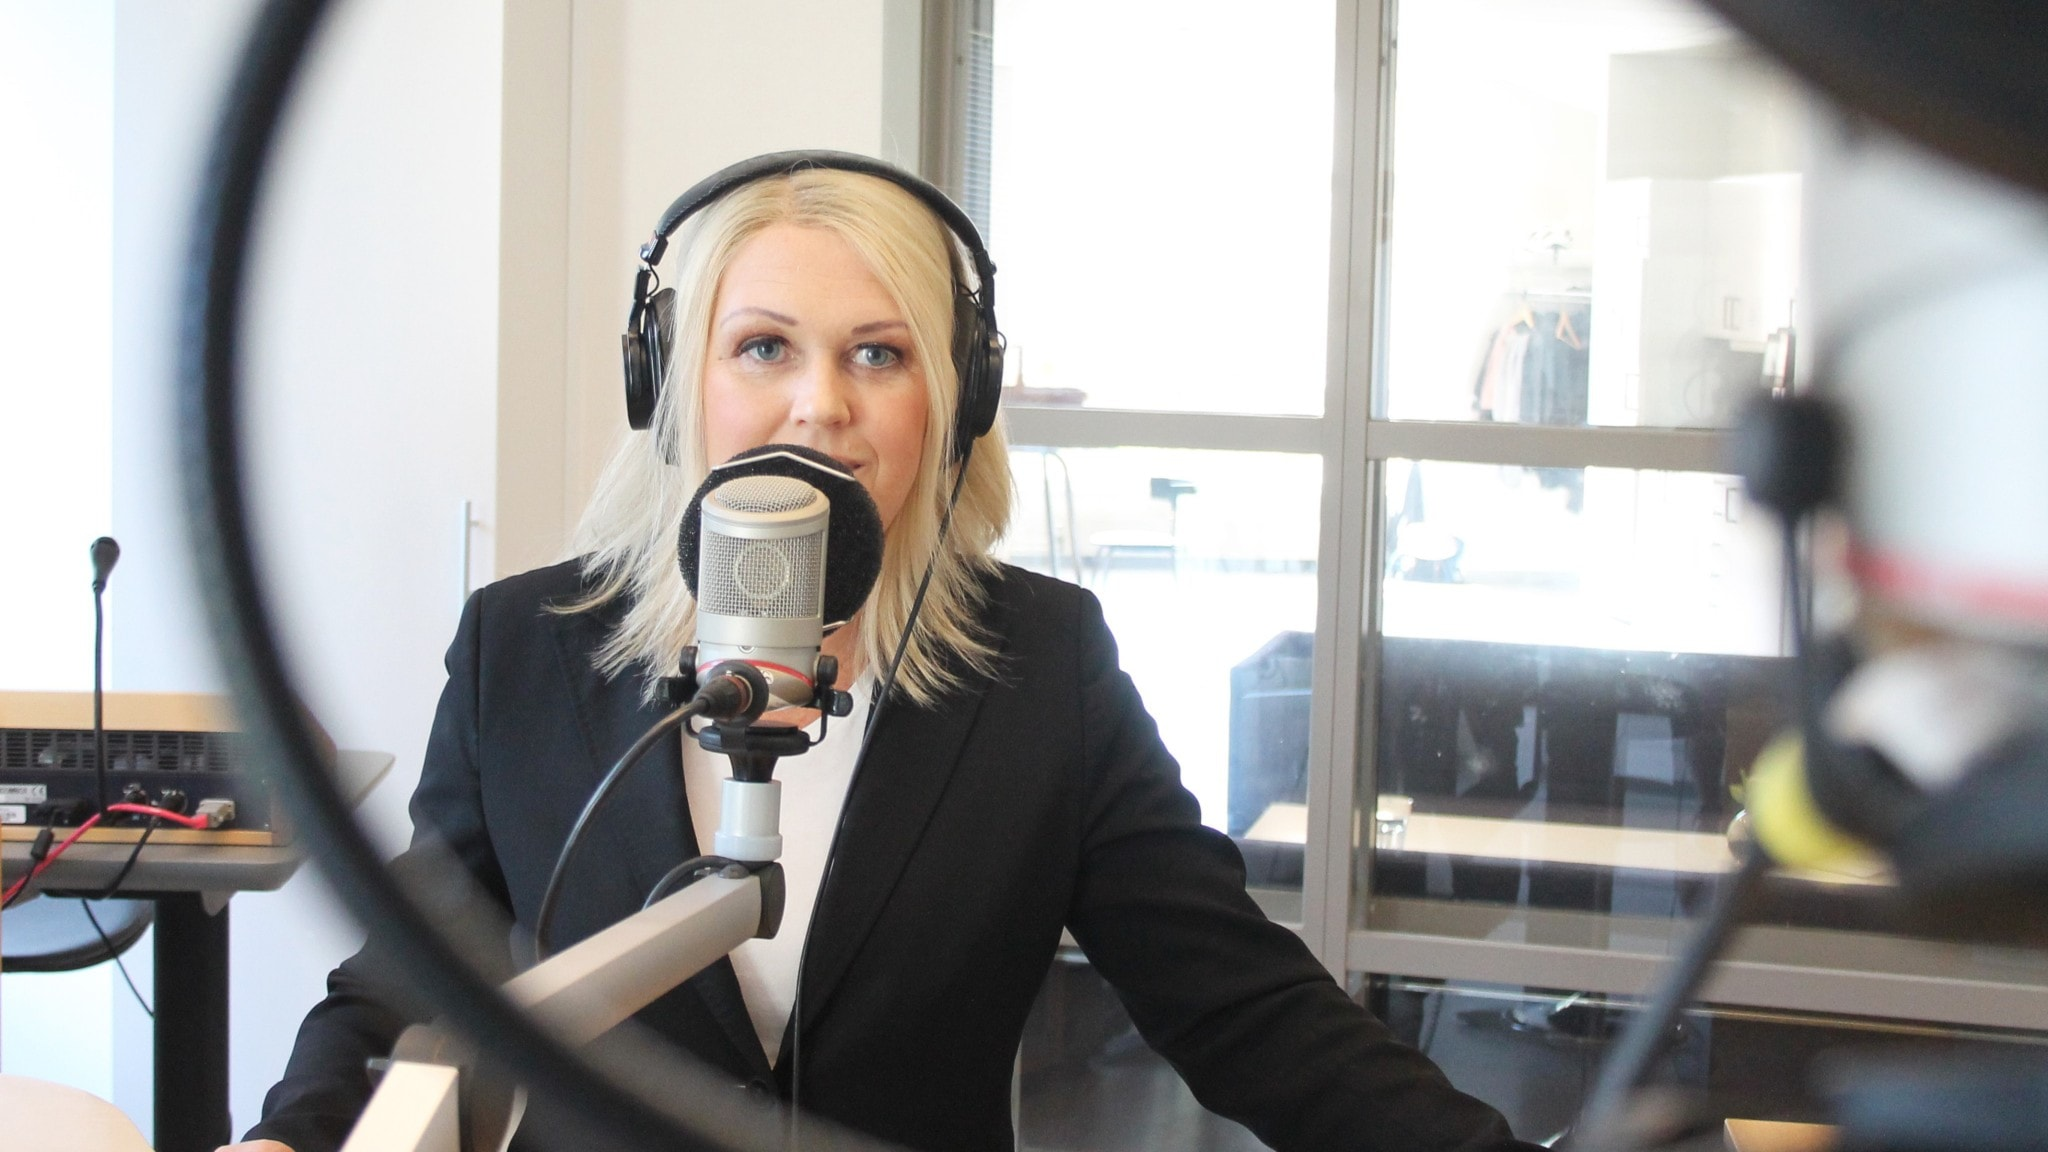 Kvinna vid mikrofon i radiostudio.